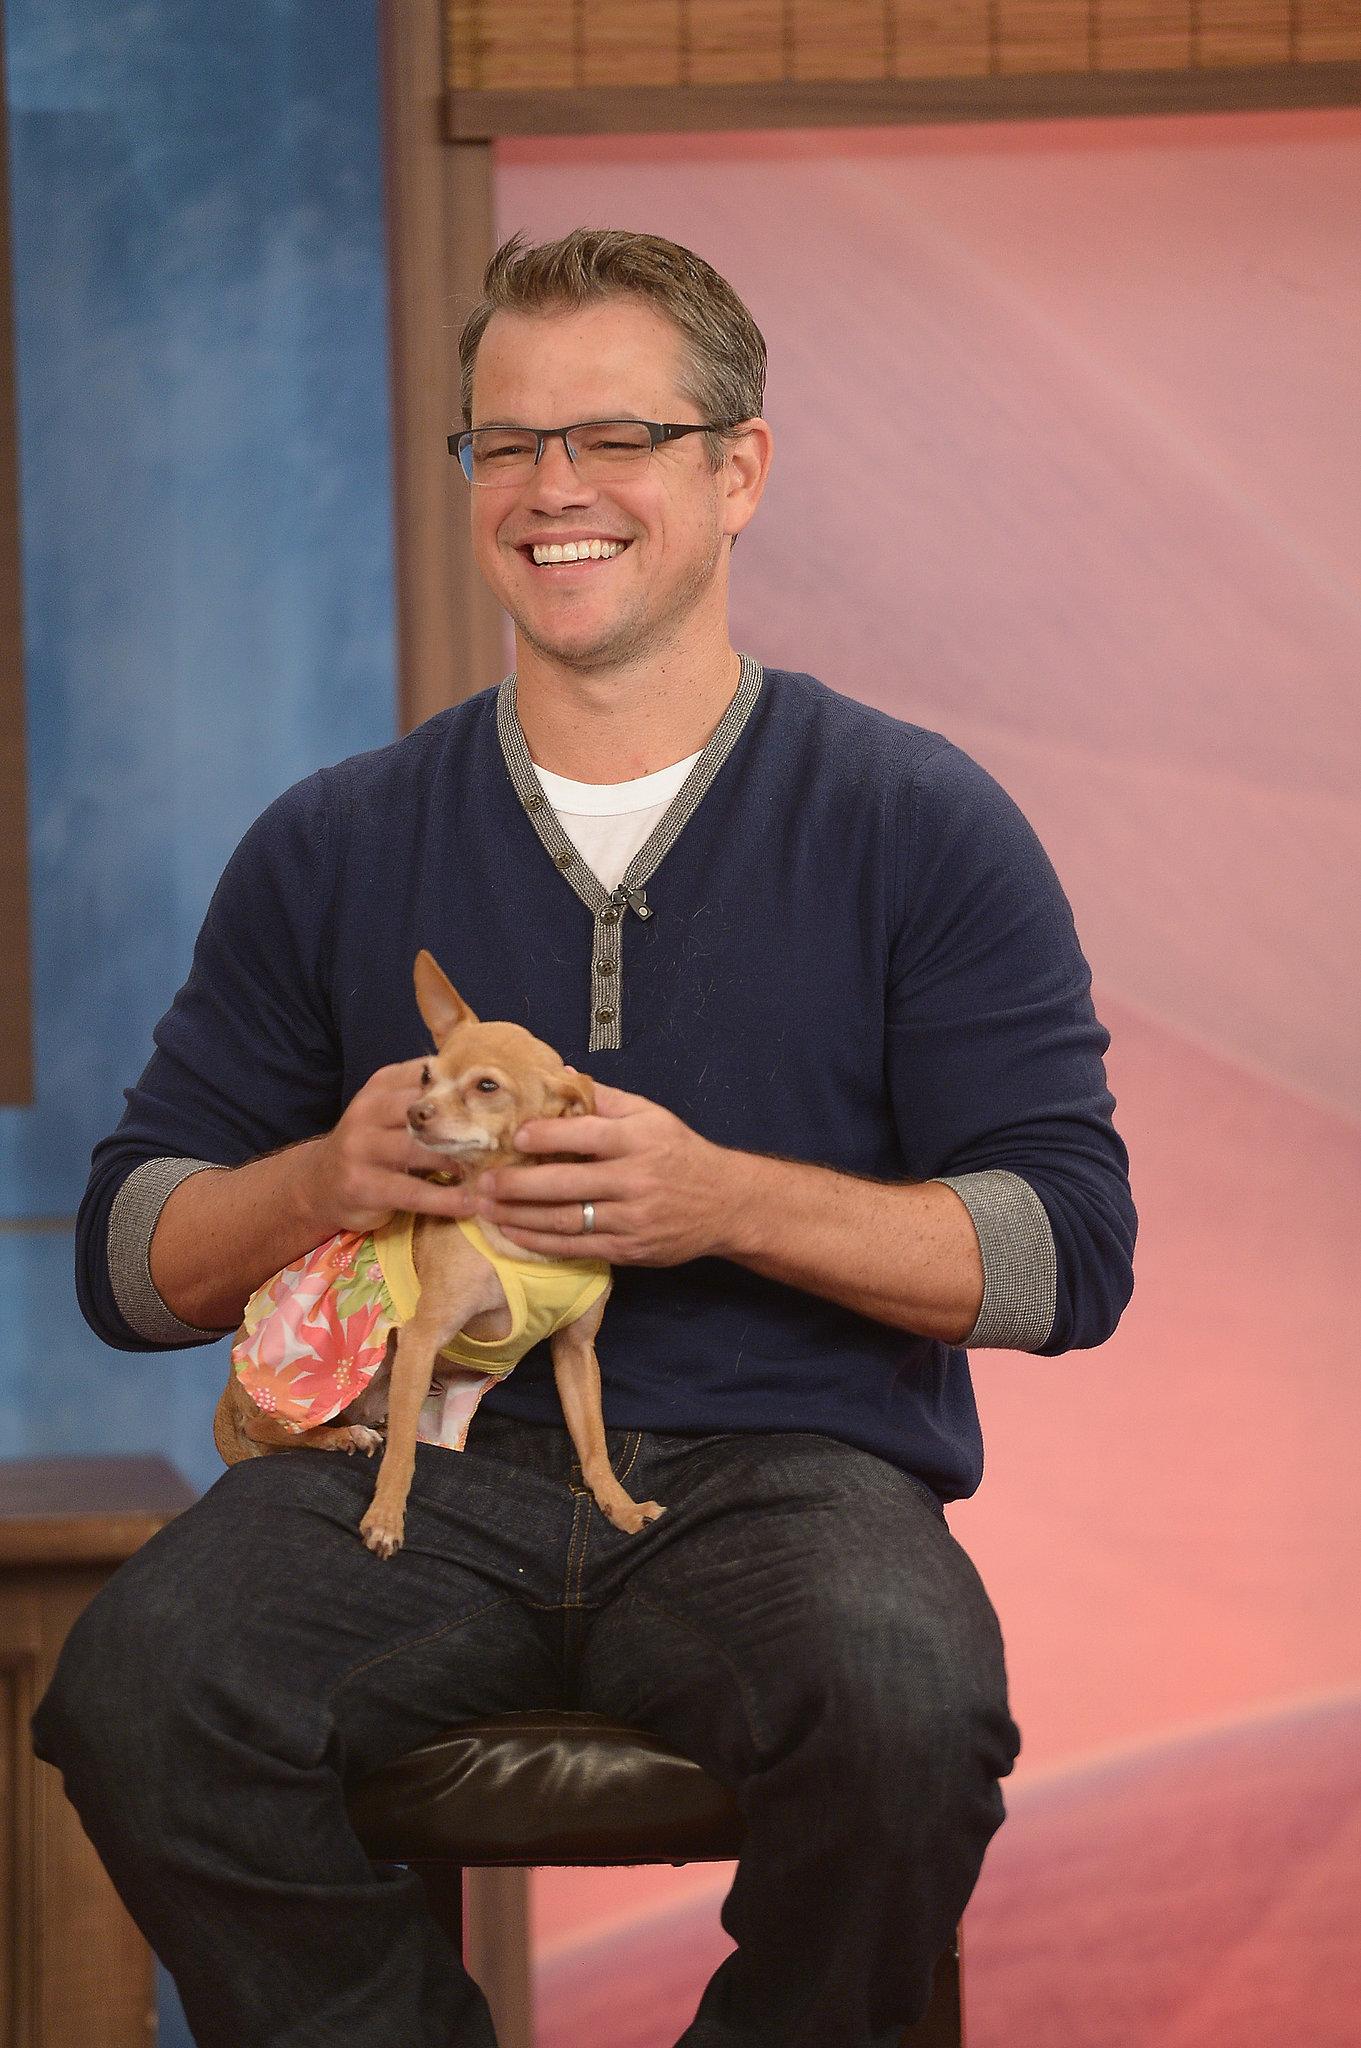 Matt Damon cradled a chihuahua during a stop on Despierta America in Miami.